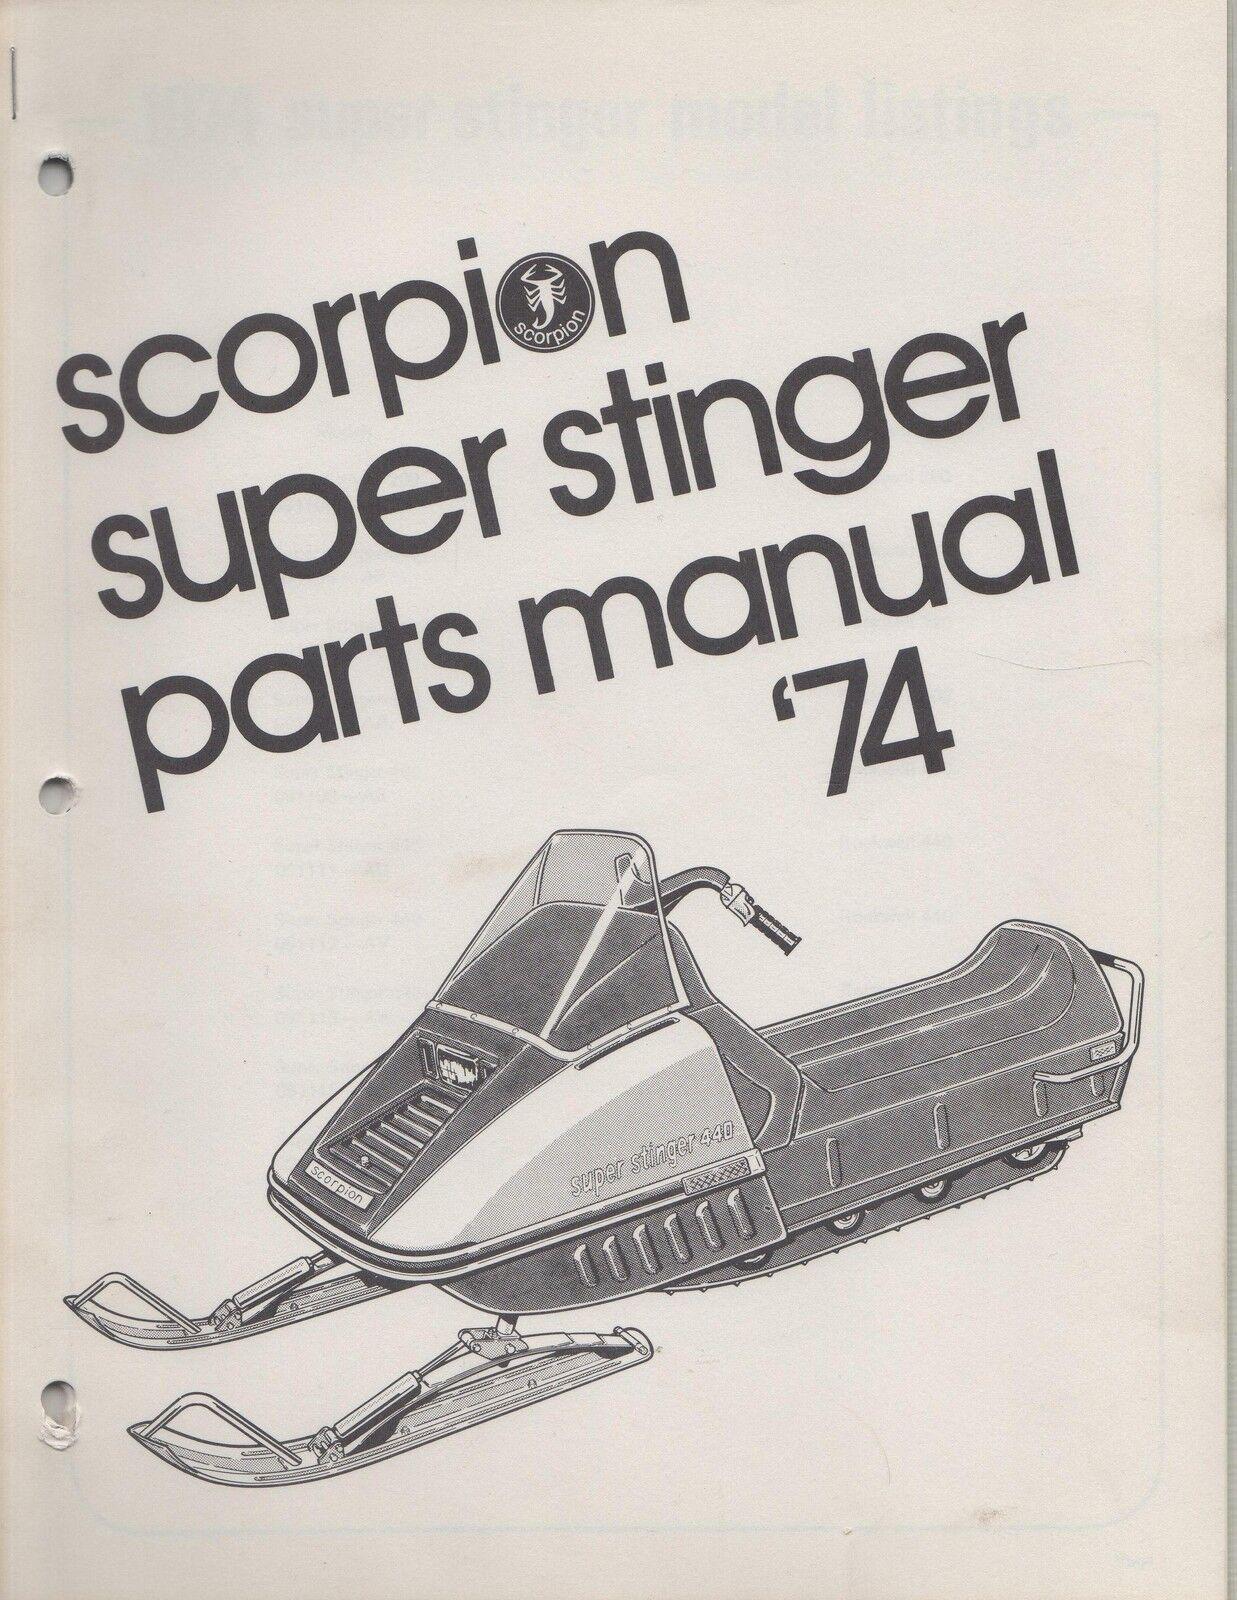 1974 SCORPION SUPER STINGER SNOWMOBILE PARTS MANUAL NEW